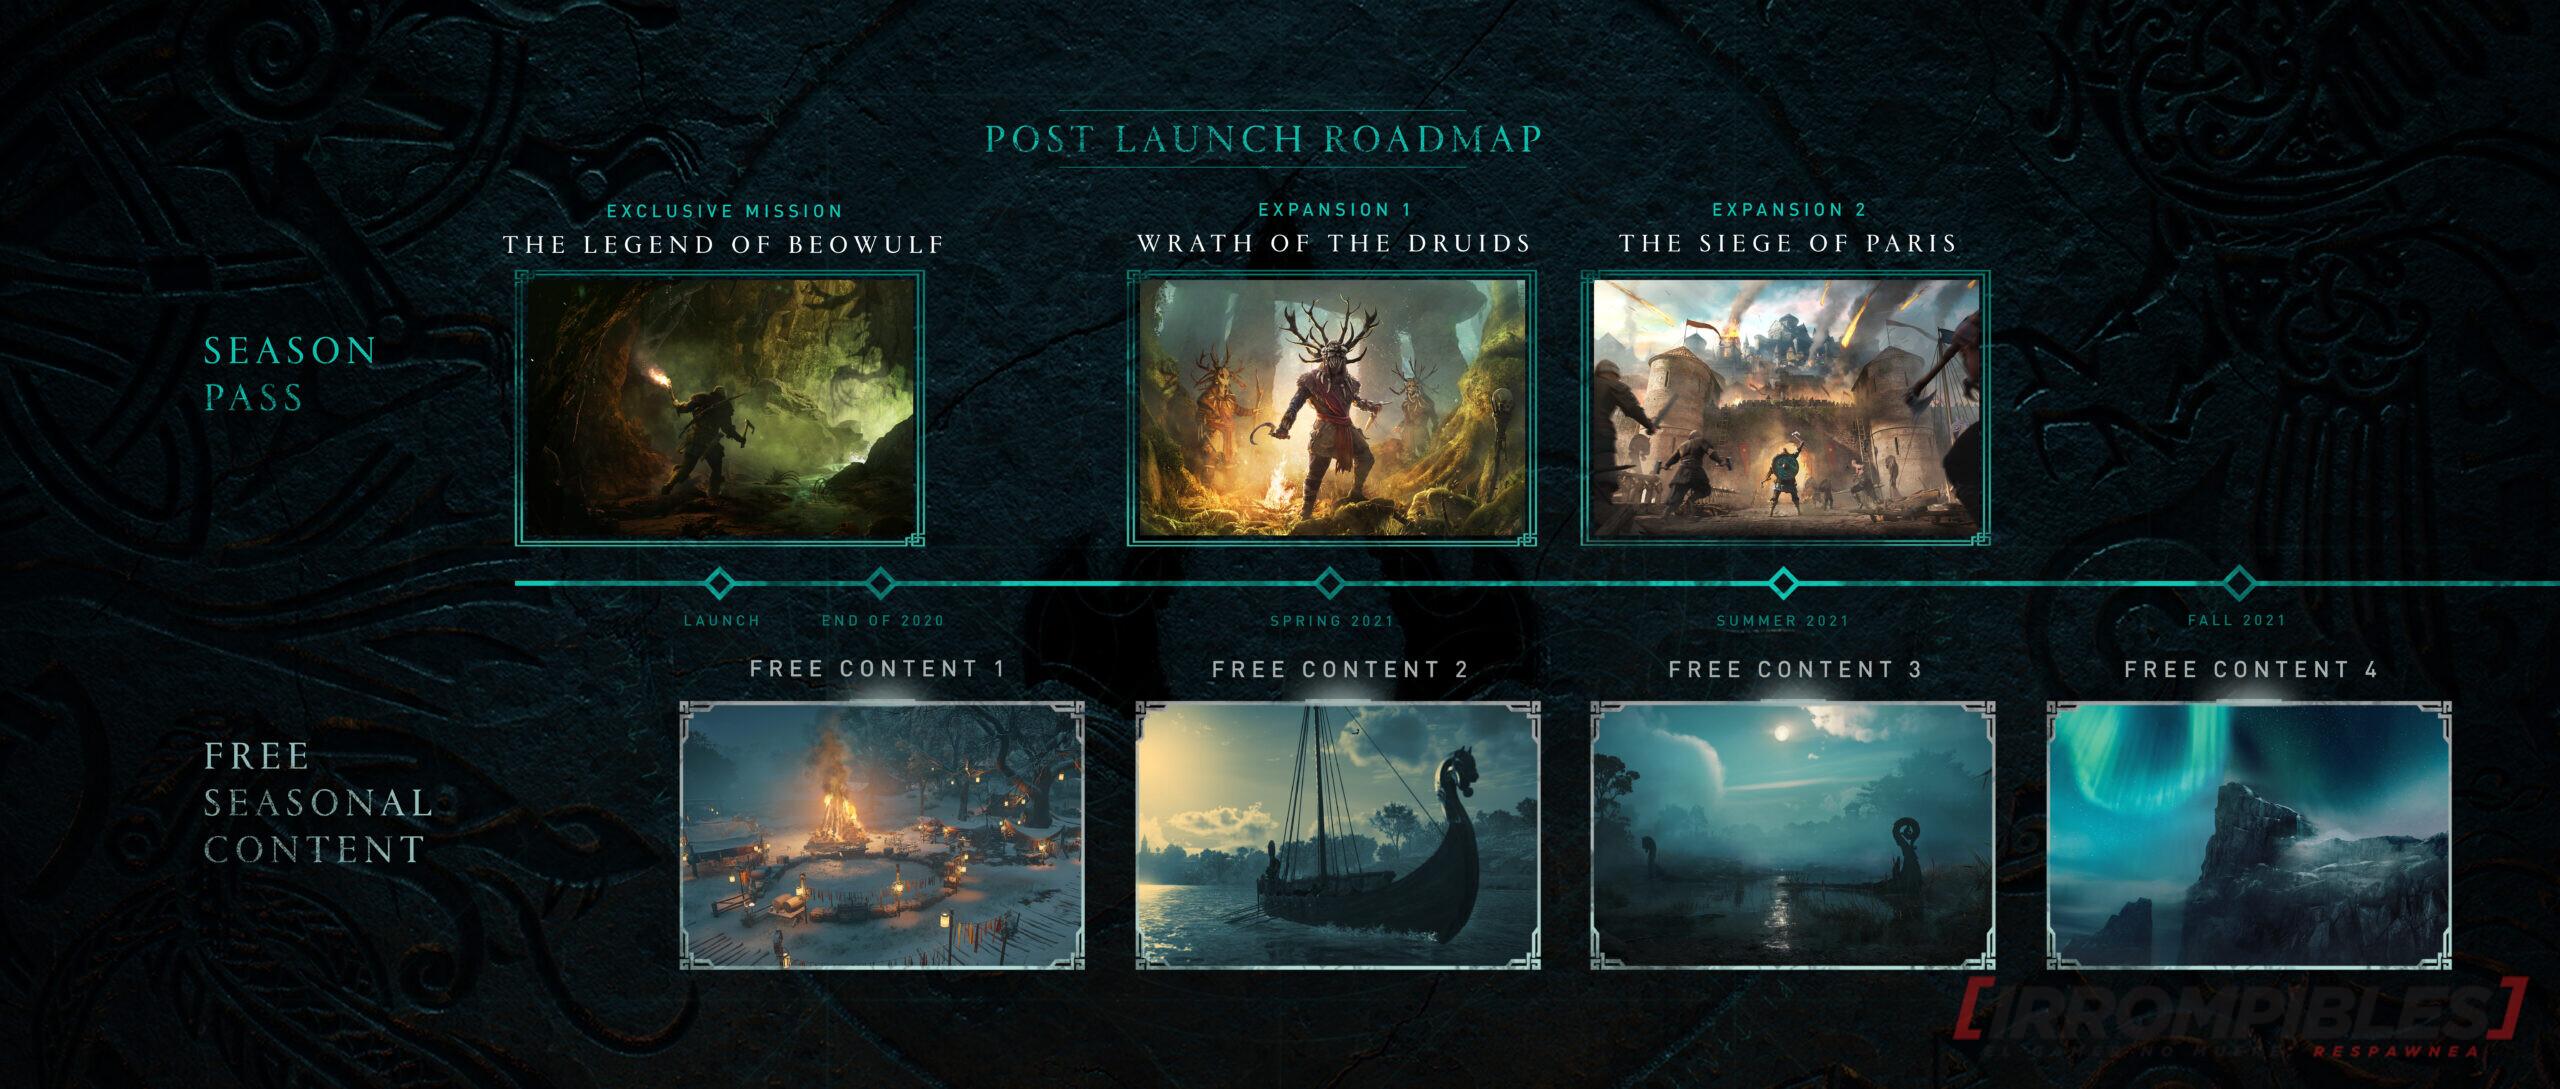 Assassin's creed valhalla roadmap